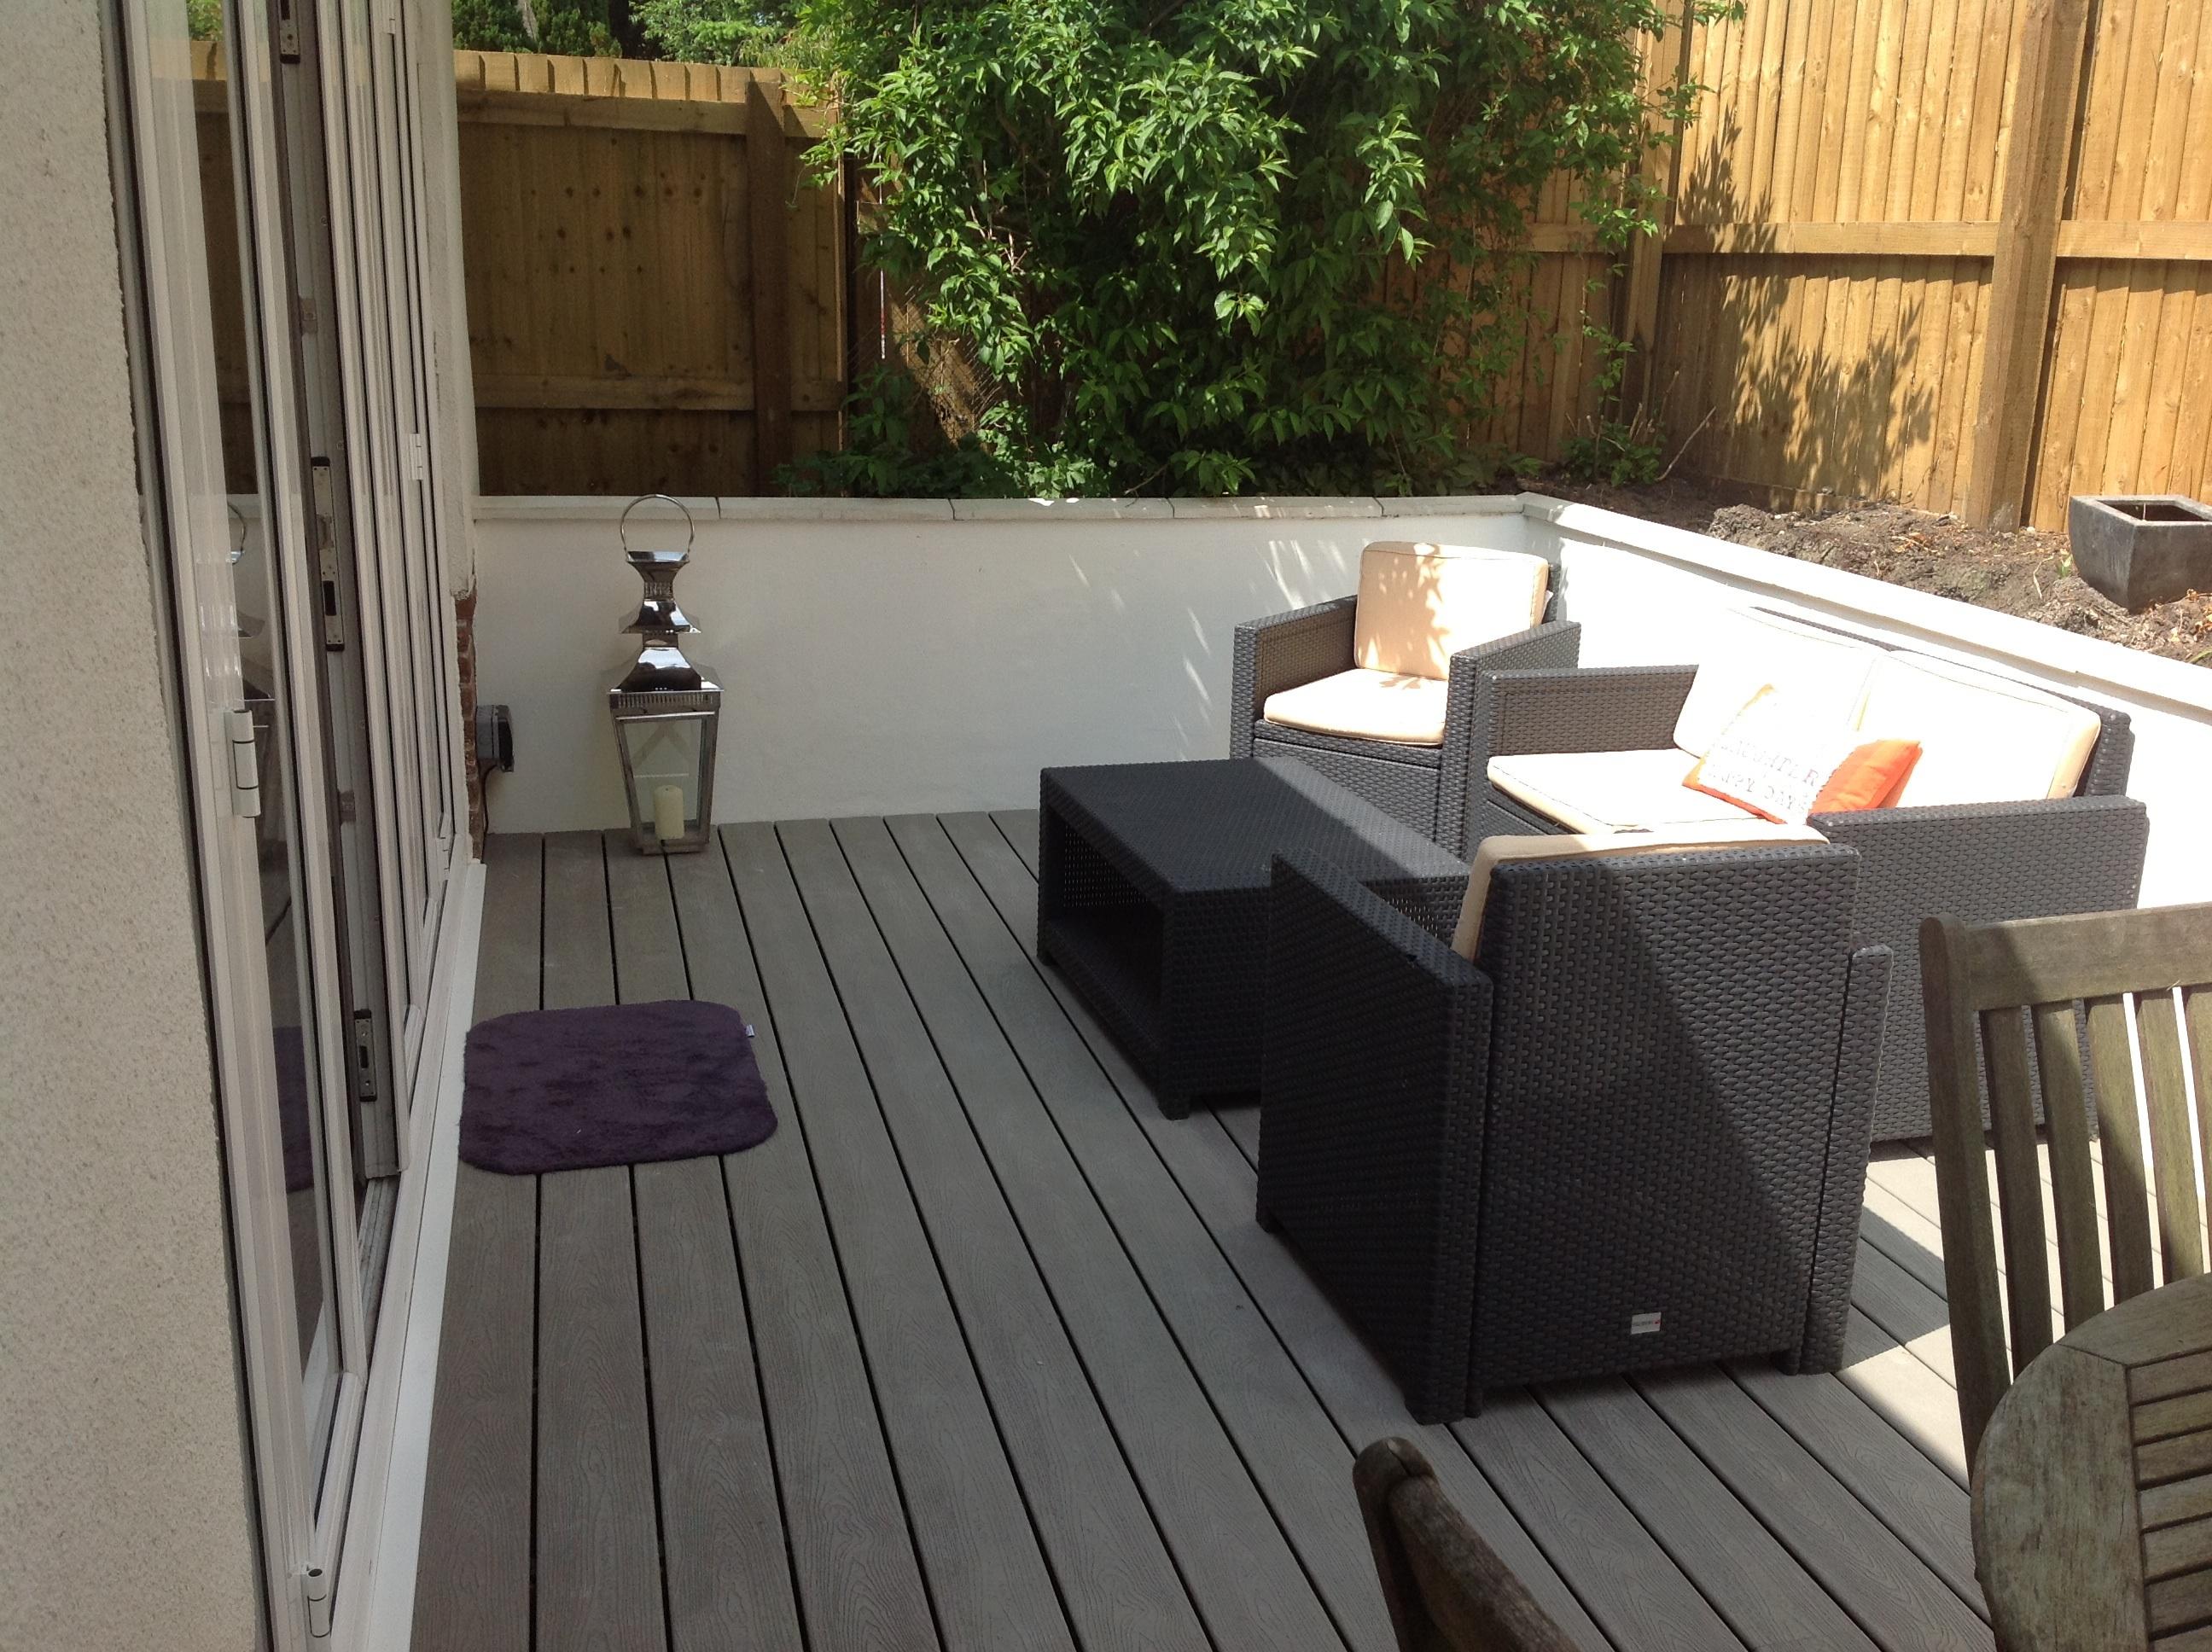 Decking gardens kevin hiley construction for Garden decking examples